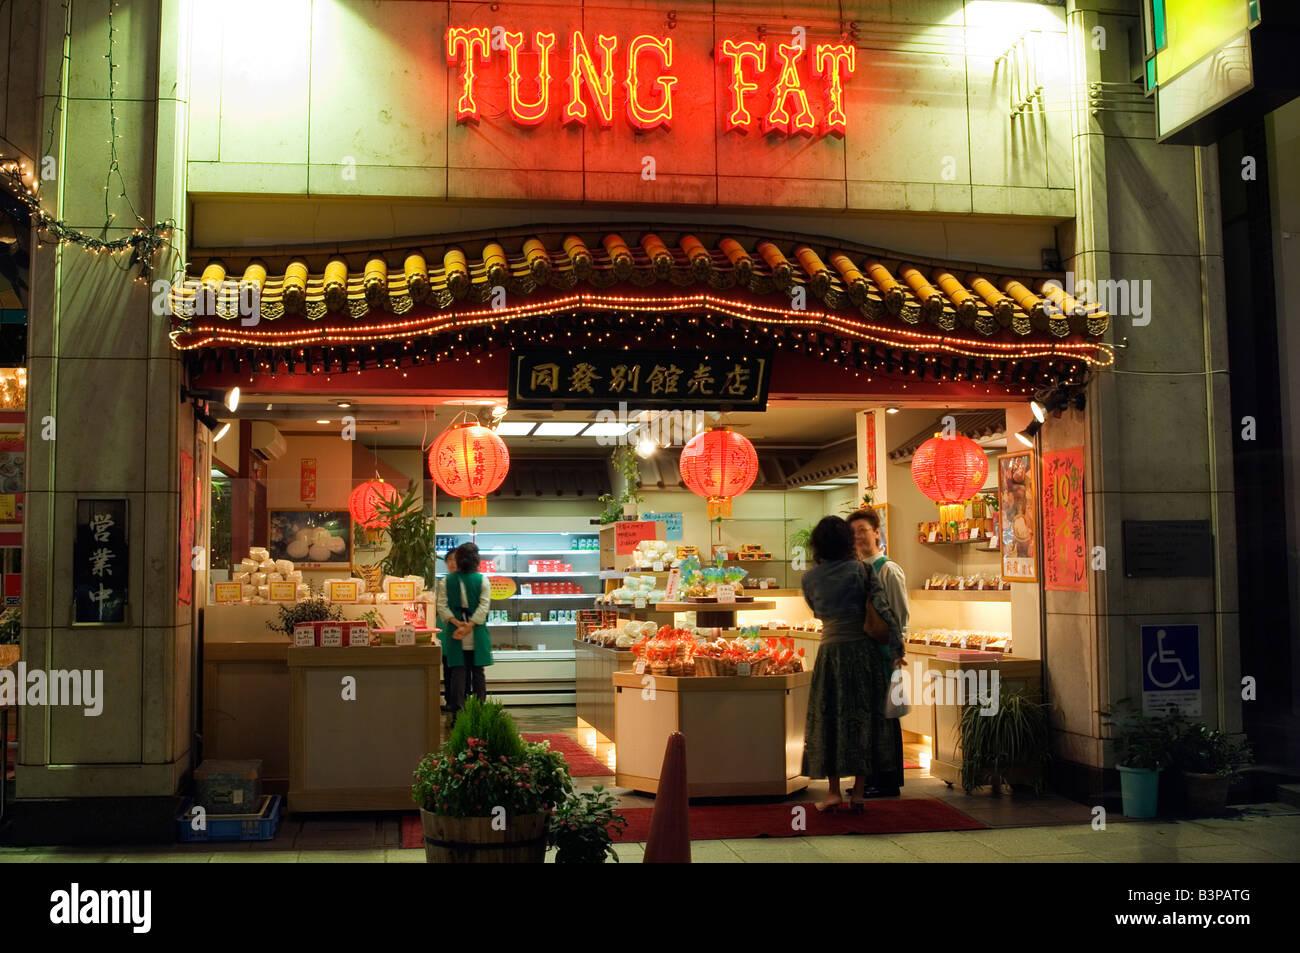 Japan, Kanagawa Prefecture, Yokohama. Yokohama,  China town restaurant at night - Stock Image